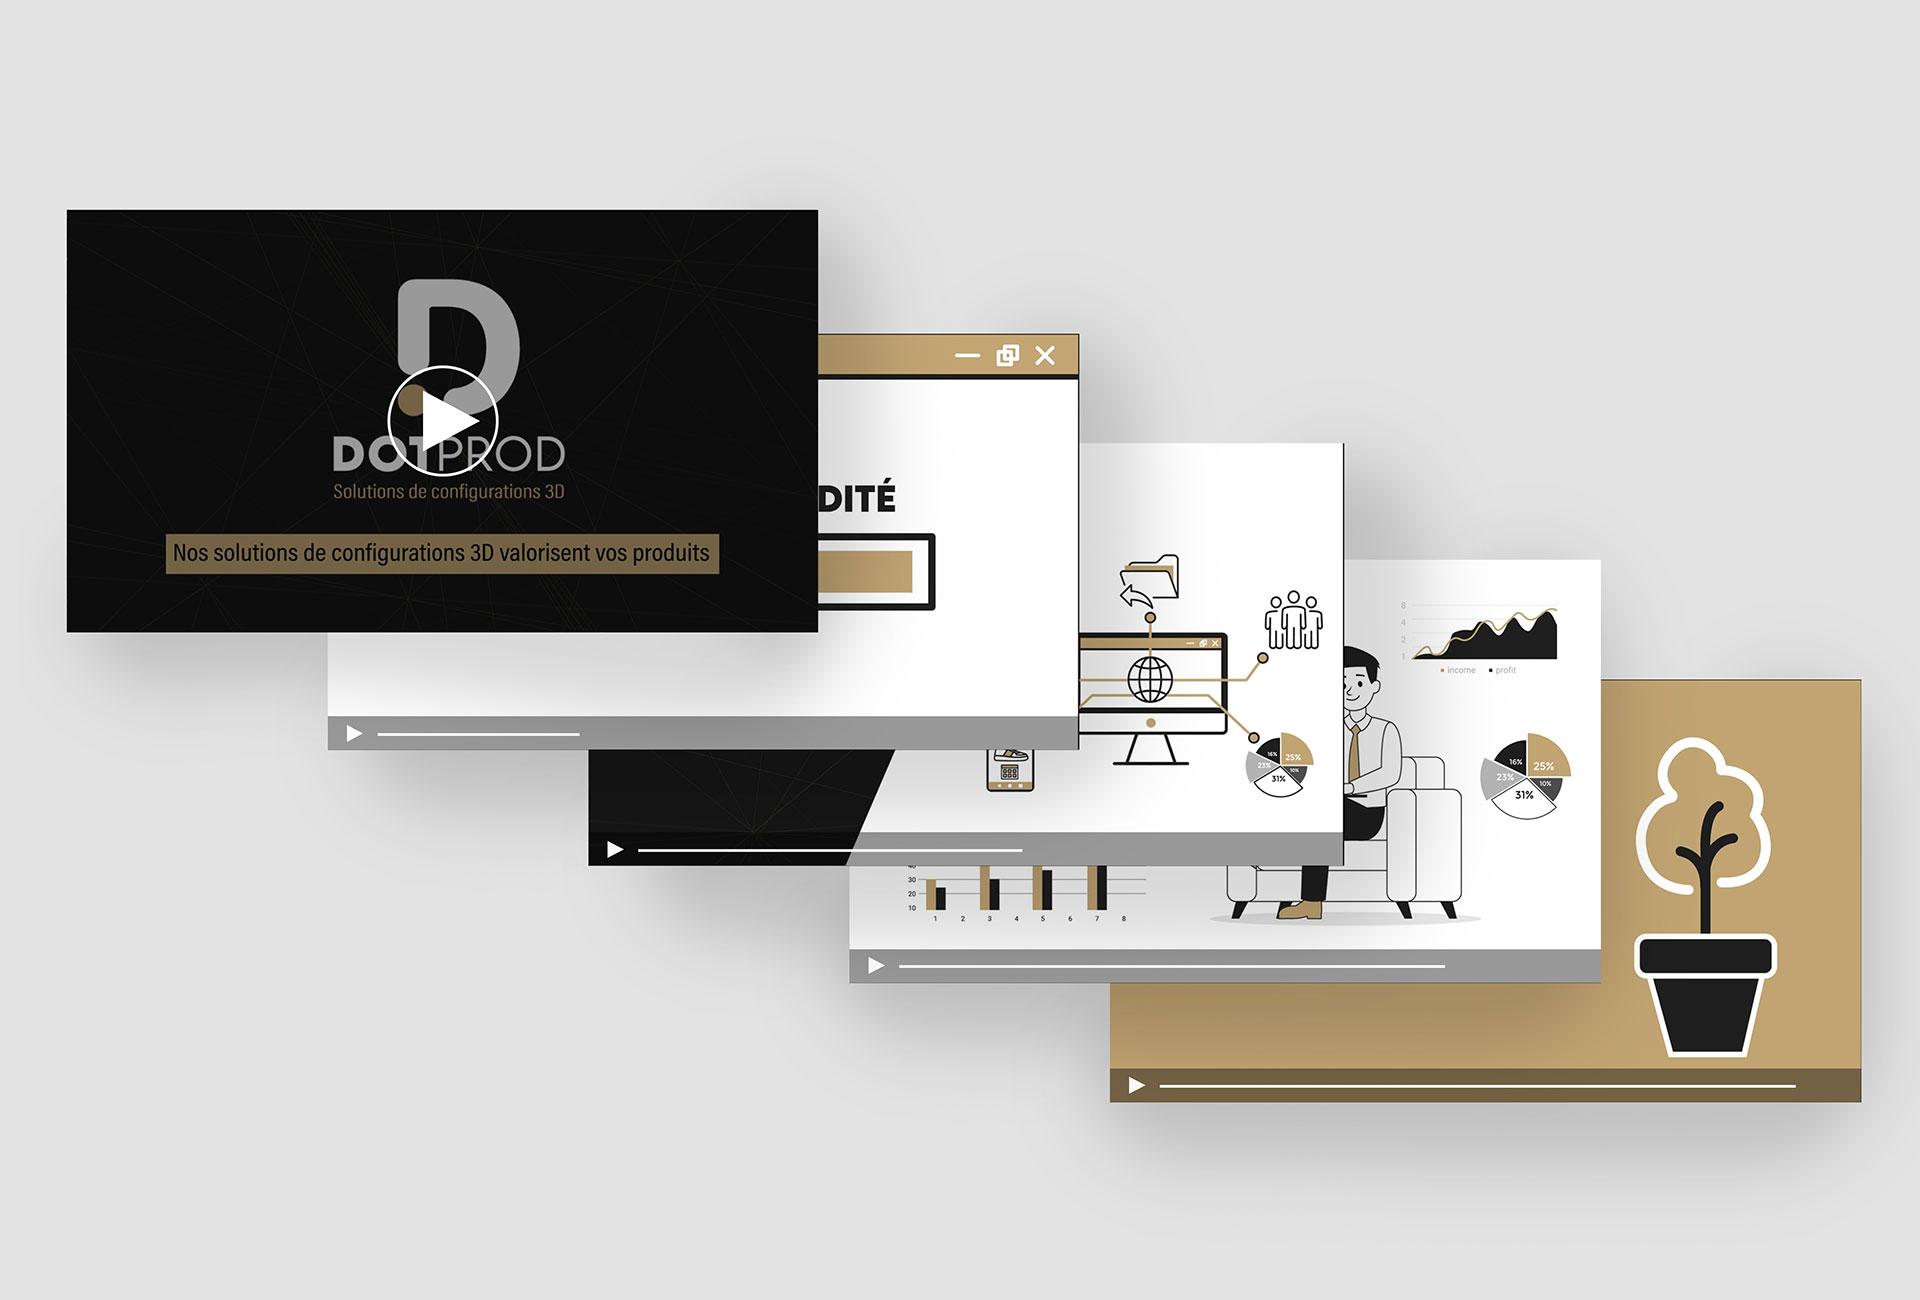 DotProd-Mockup-video